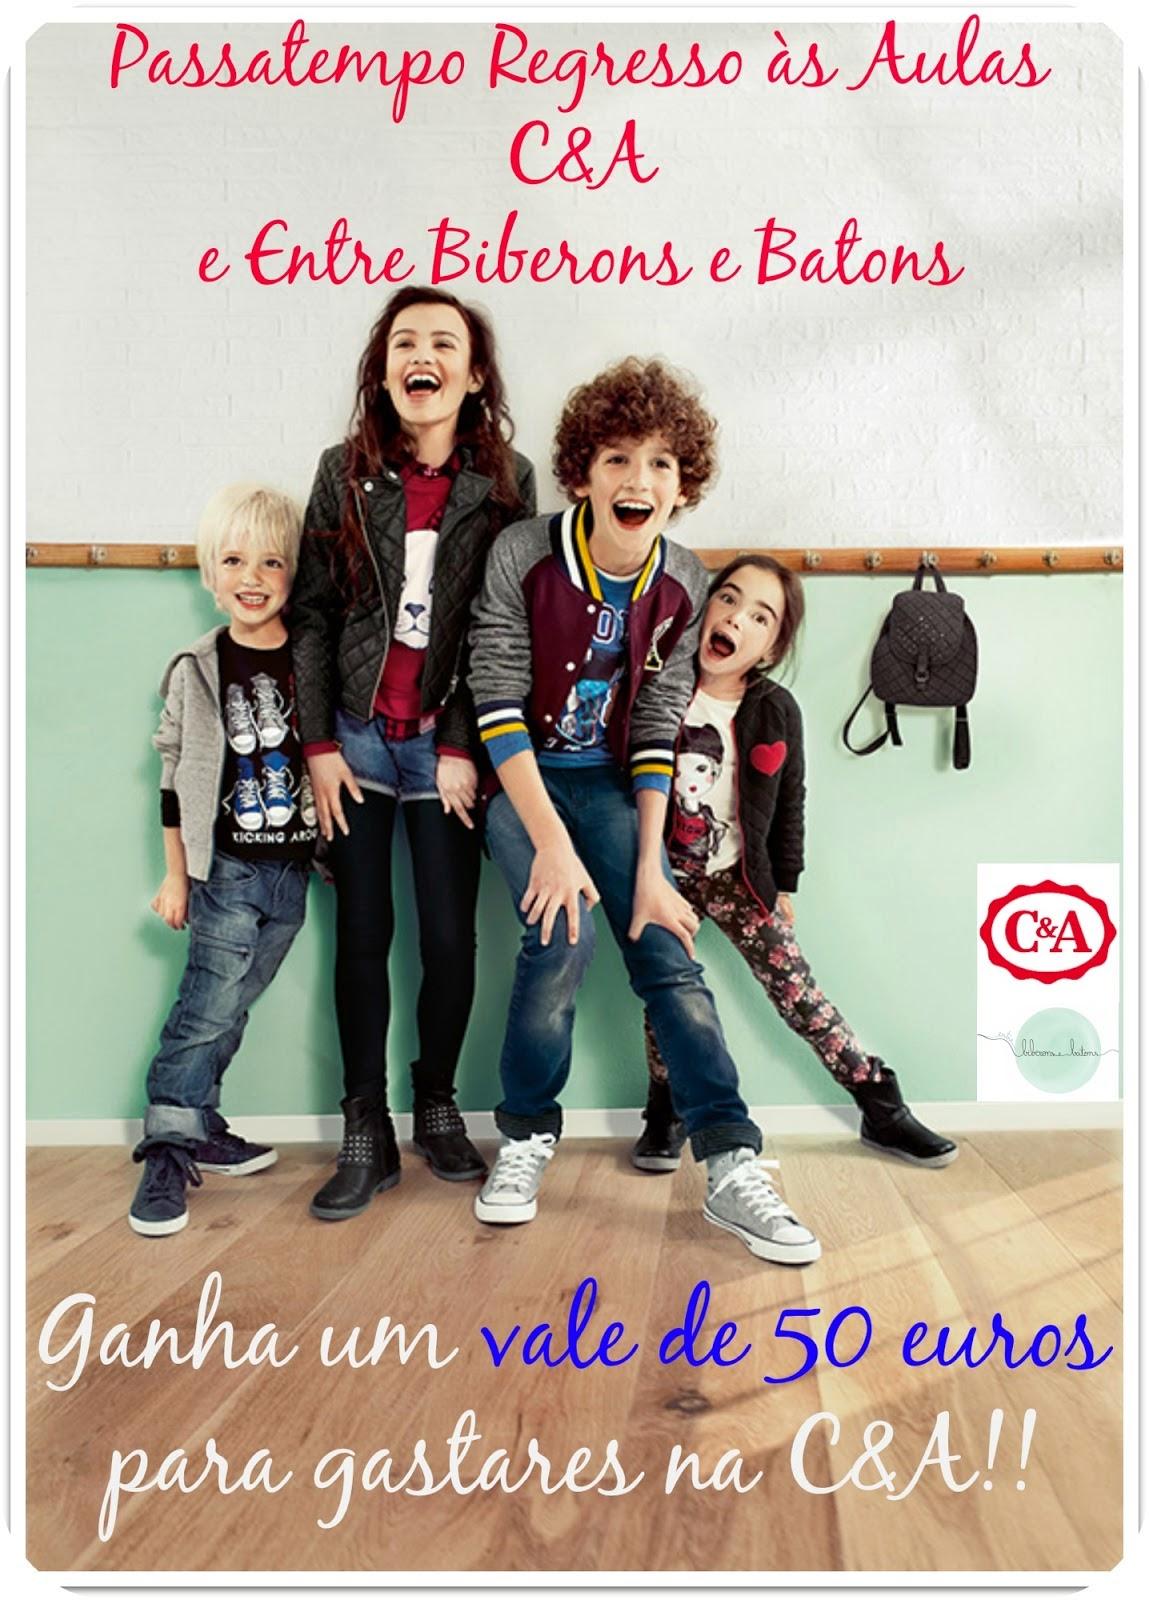 http://entrebiberonsebatons.blogspot.pt/2014/08/passatempo-regresso-as-aulas-c-e-entre.html